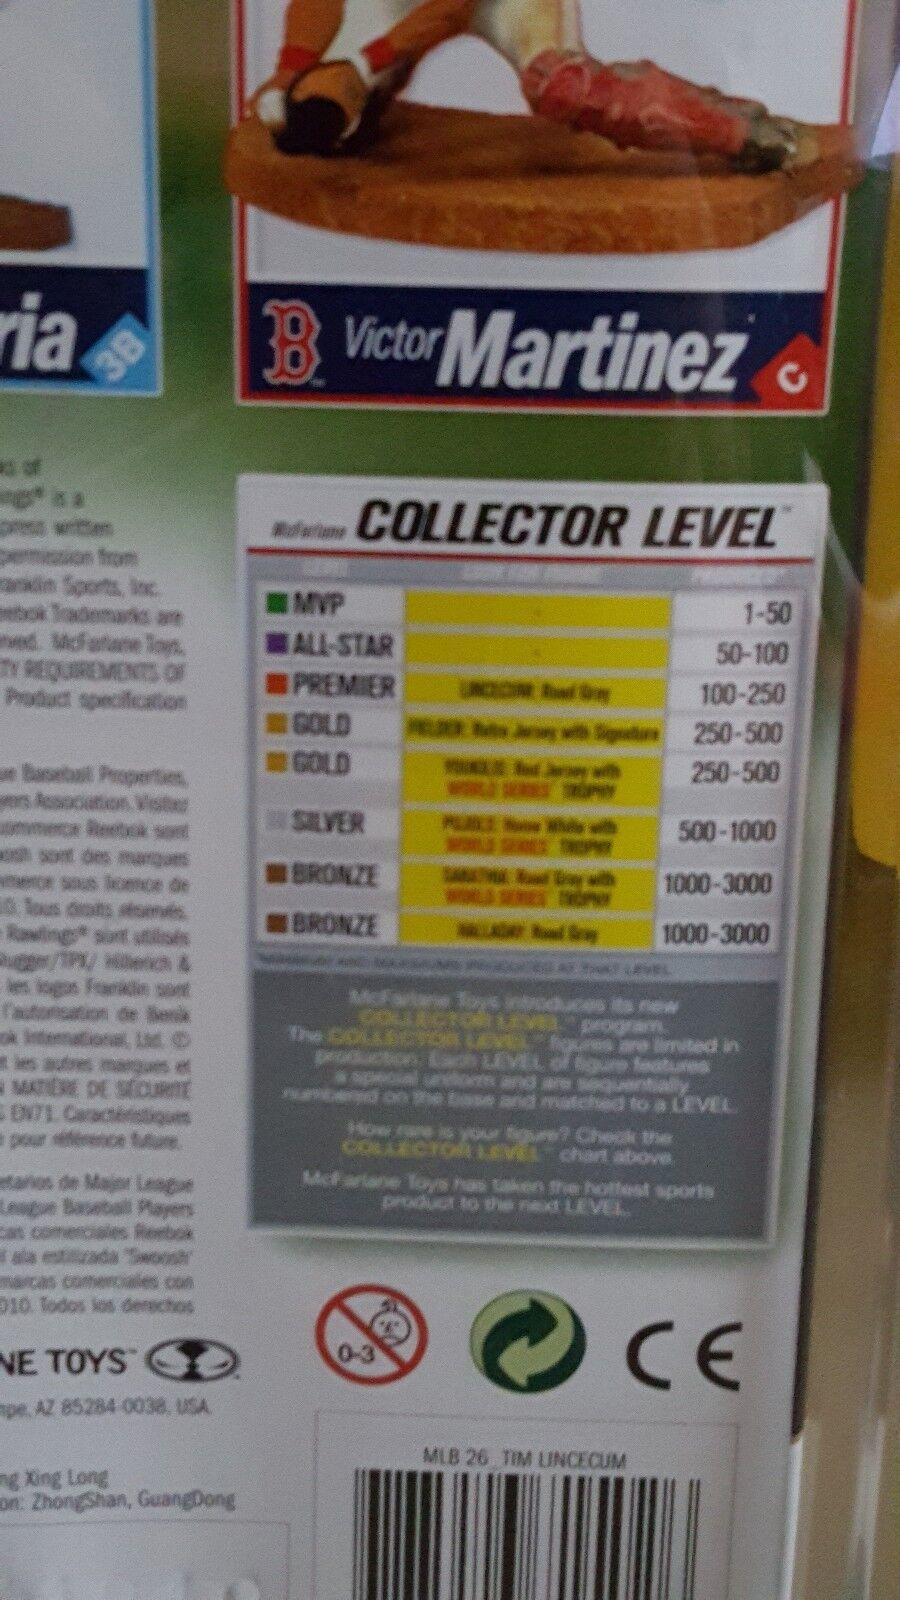 MCFARLANE MLB 26 TIM LINCECUM COLLECTOR LEVEL GREY JERSEY JERSEY JERSEY VARIANT FIGURE 712a0a